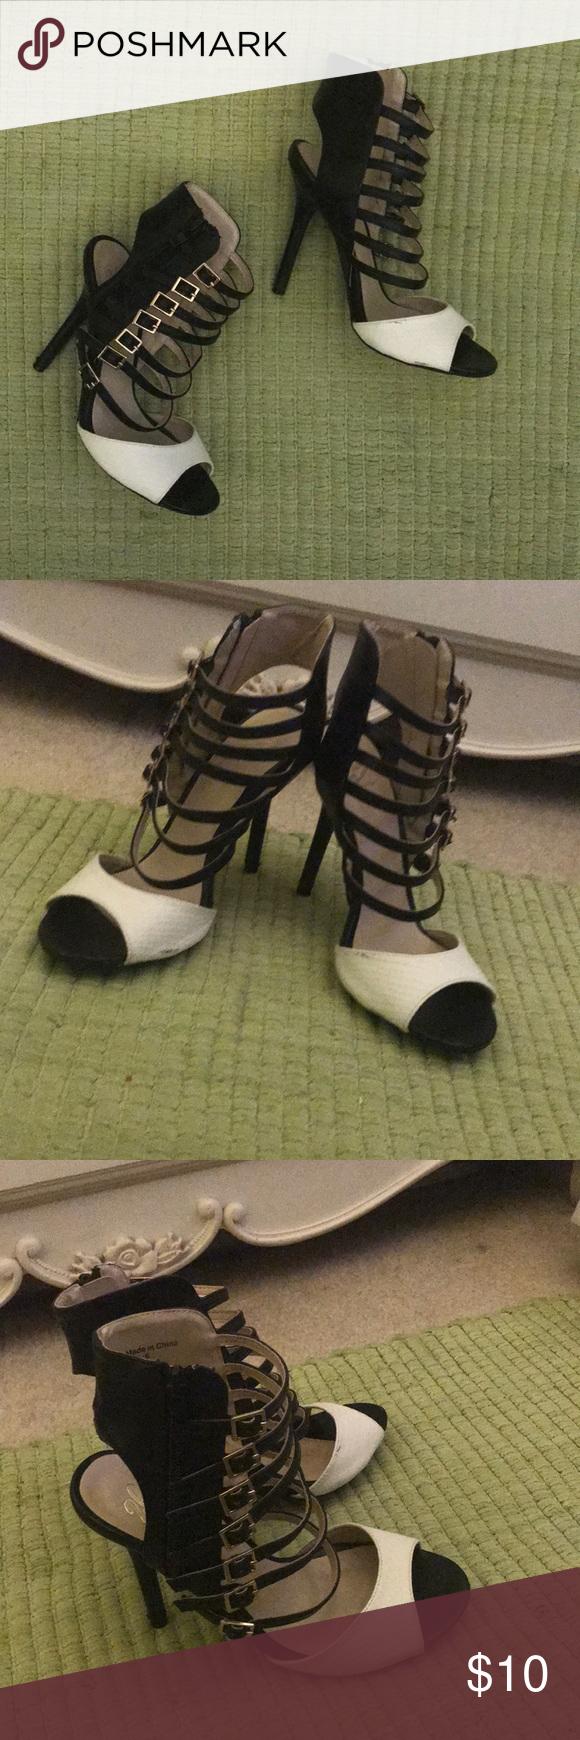 d0ba9d1263a Bebe 2 b strappy high heels. Bebe brand 2 b strappy